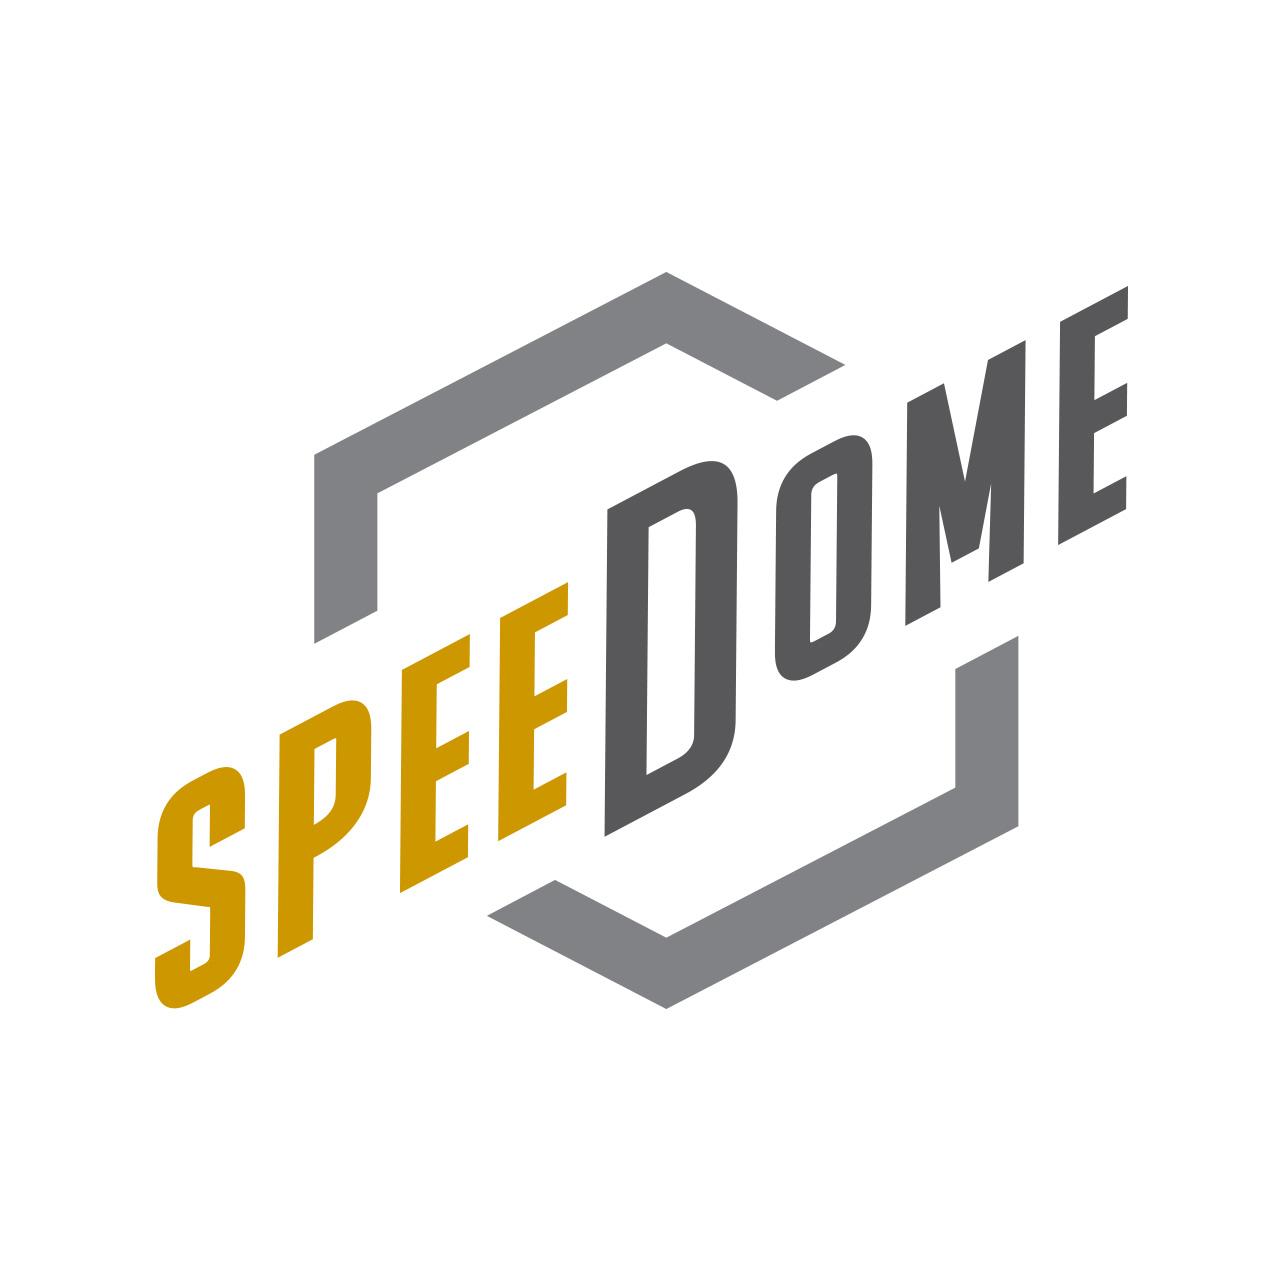 CATOMA SpeeDome Logo